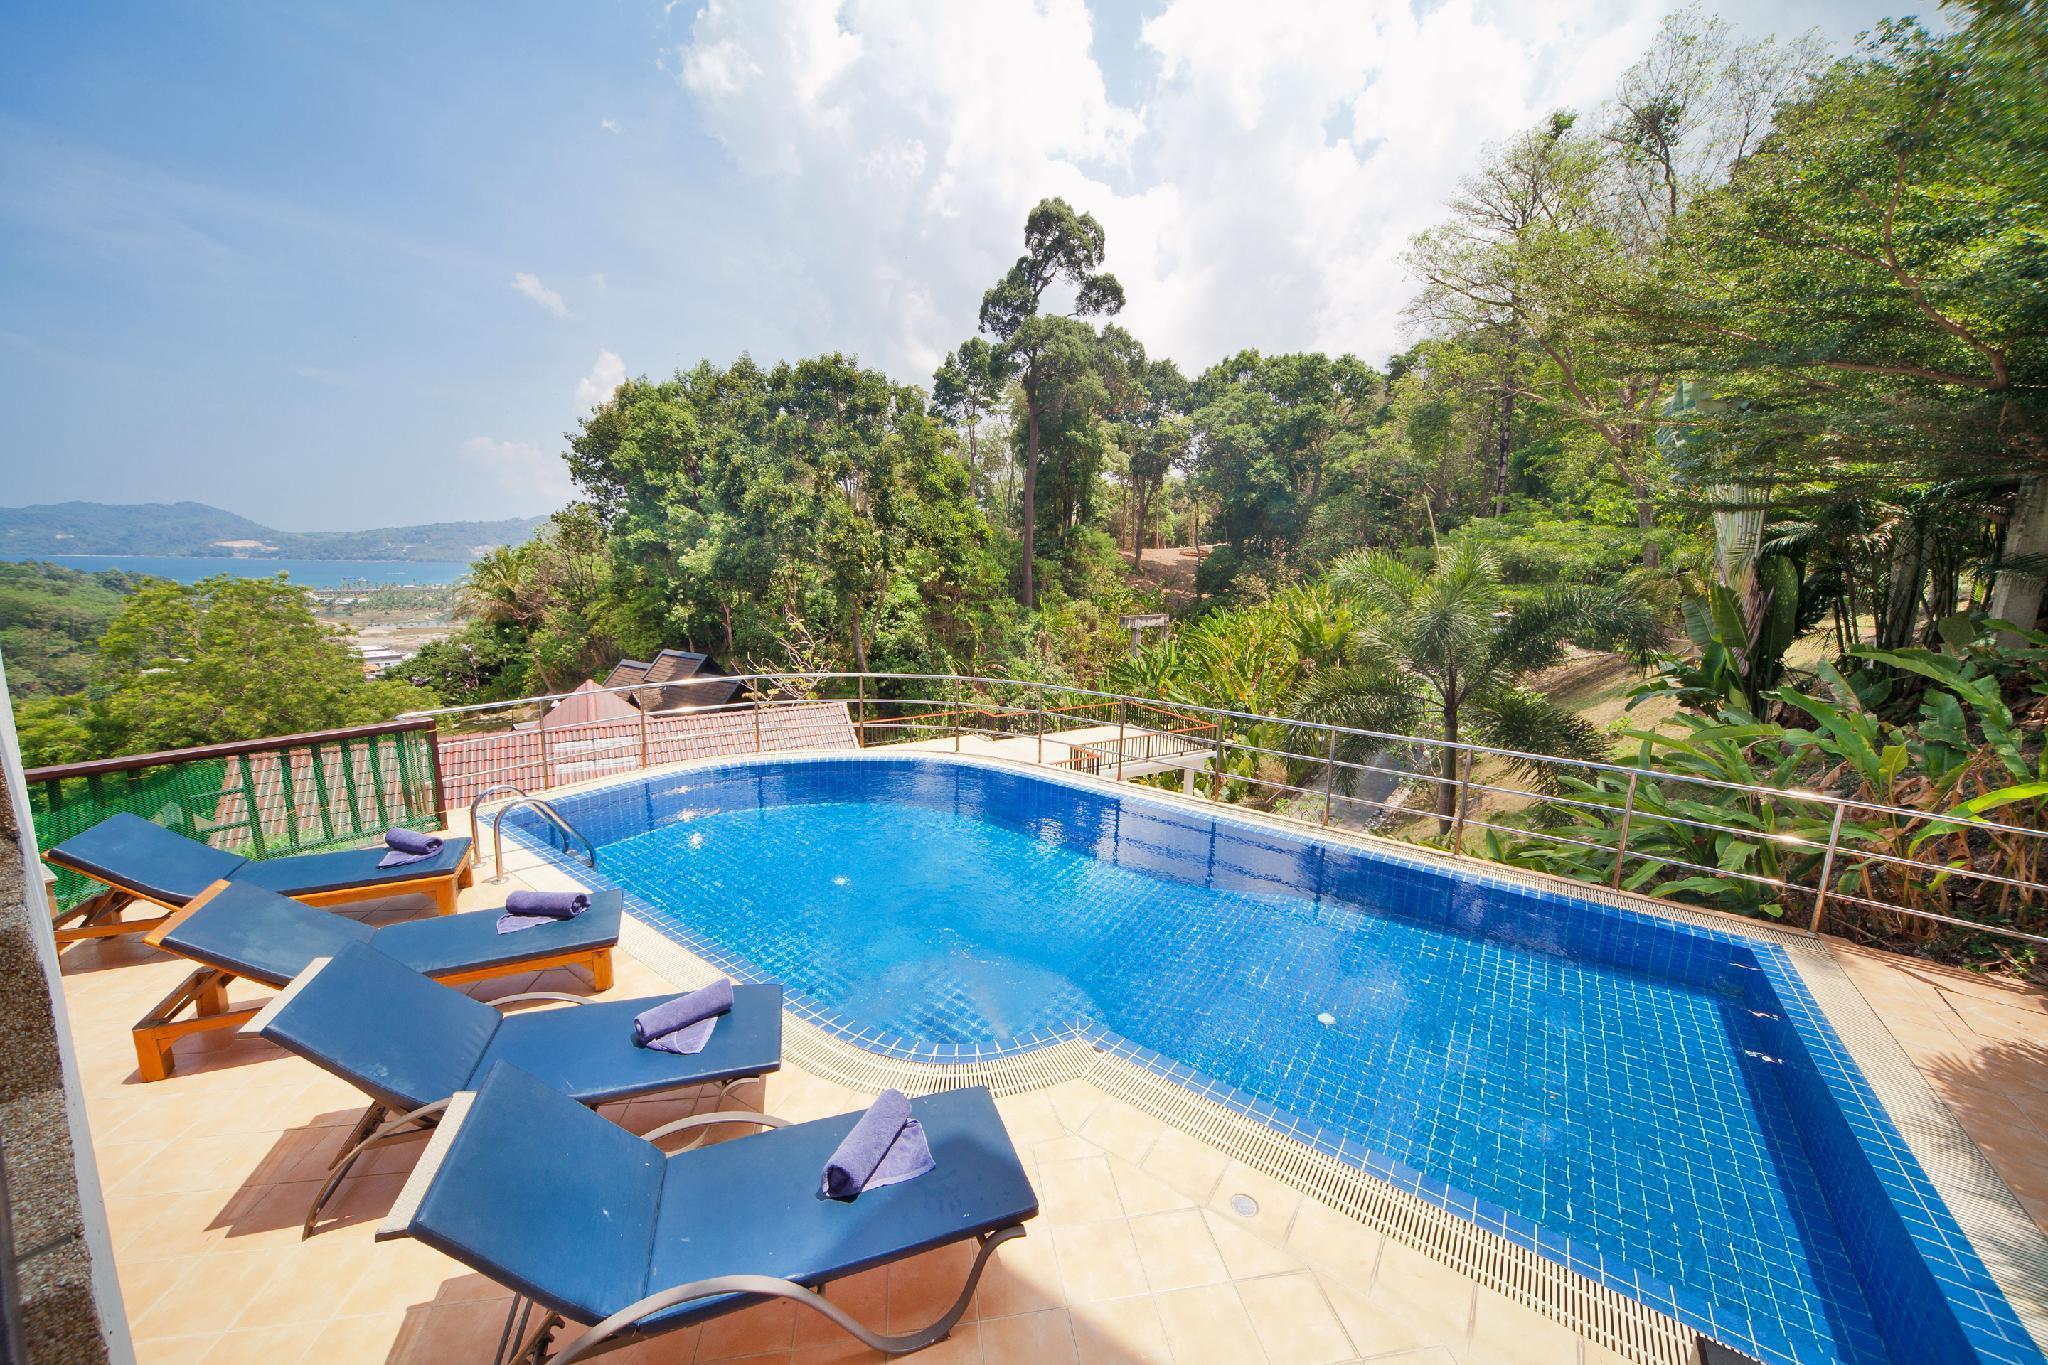 Patong Seaview Pool Villa, 2 living rooms, 5BR Patong Seaview Pool Villa, 2 living rooms, 5BR